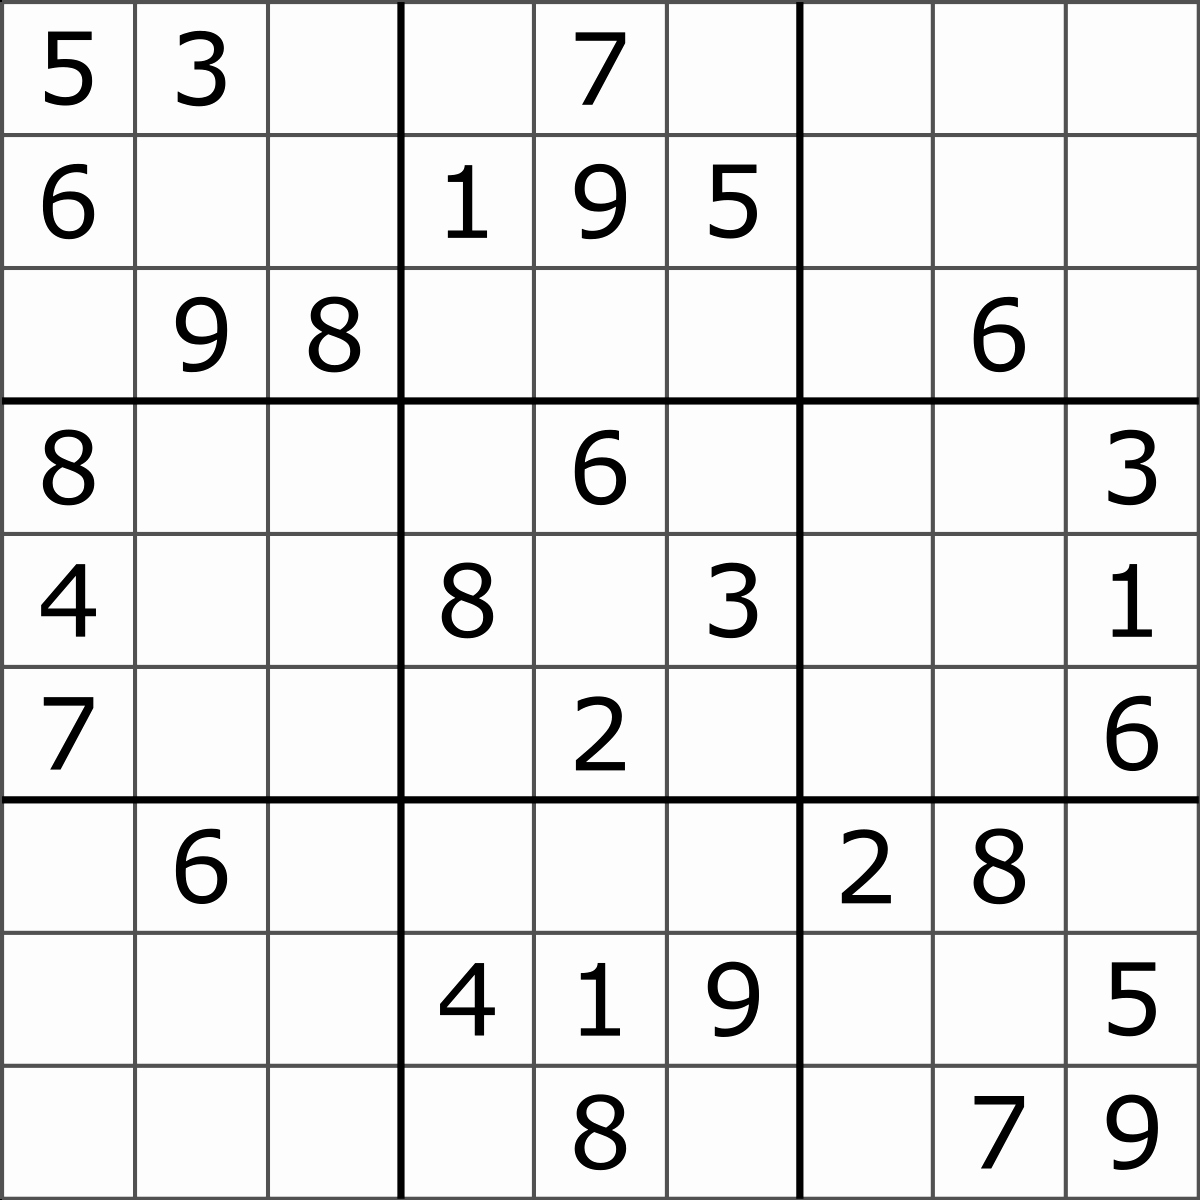 Blank Sudoku Grid Printable New Sudoku